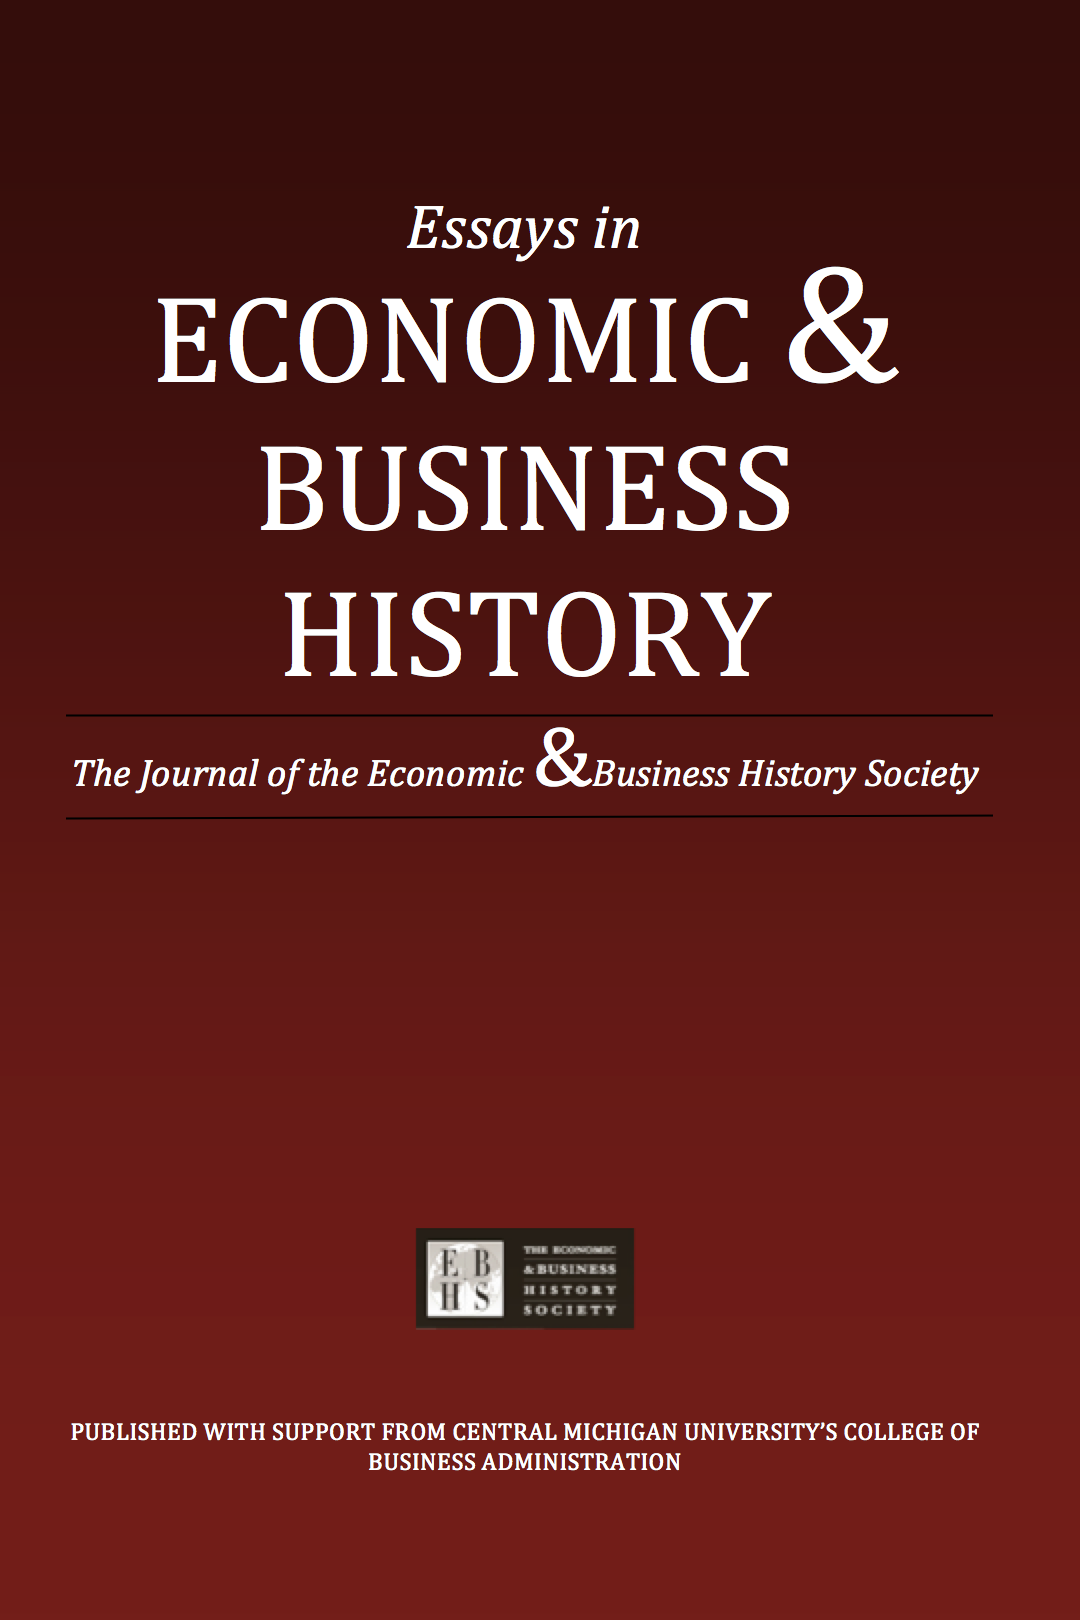 Essays in Economic & Business History 2014